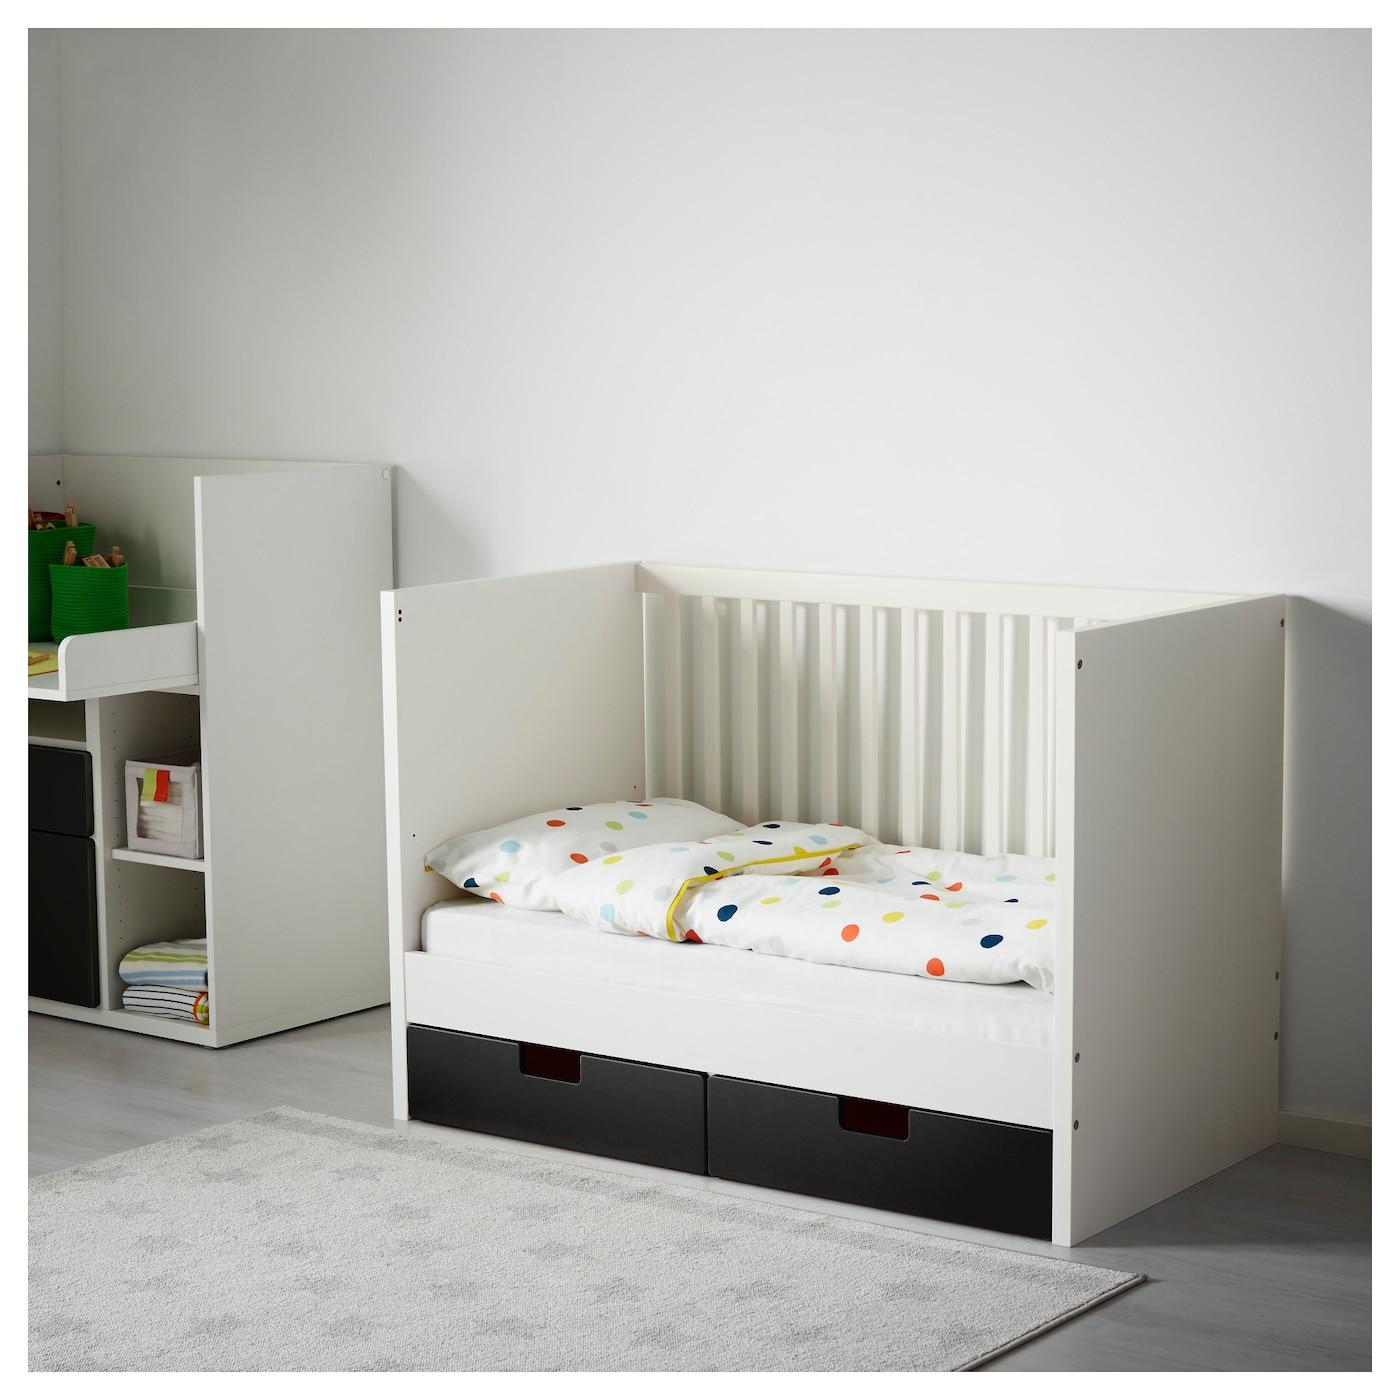 stuva lit enfant tiroirs noir 60x120 cm ikea. Black Bedroom Furniture Sets. Home Design Ideas